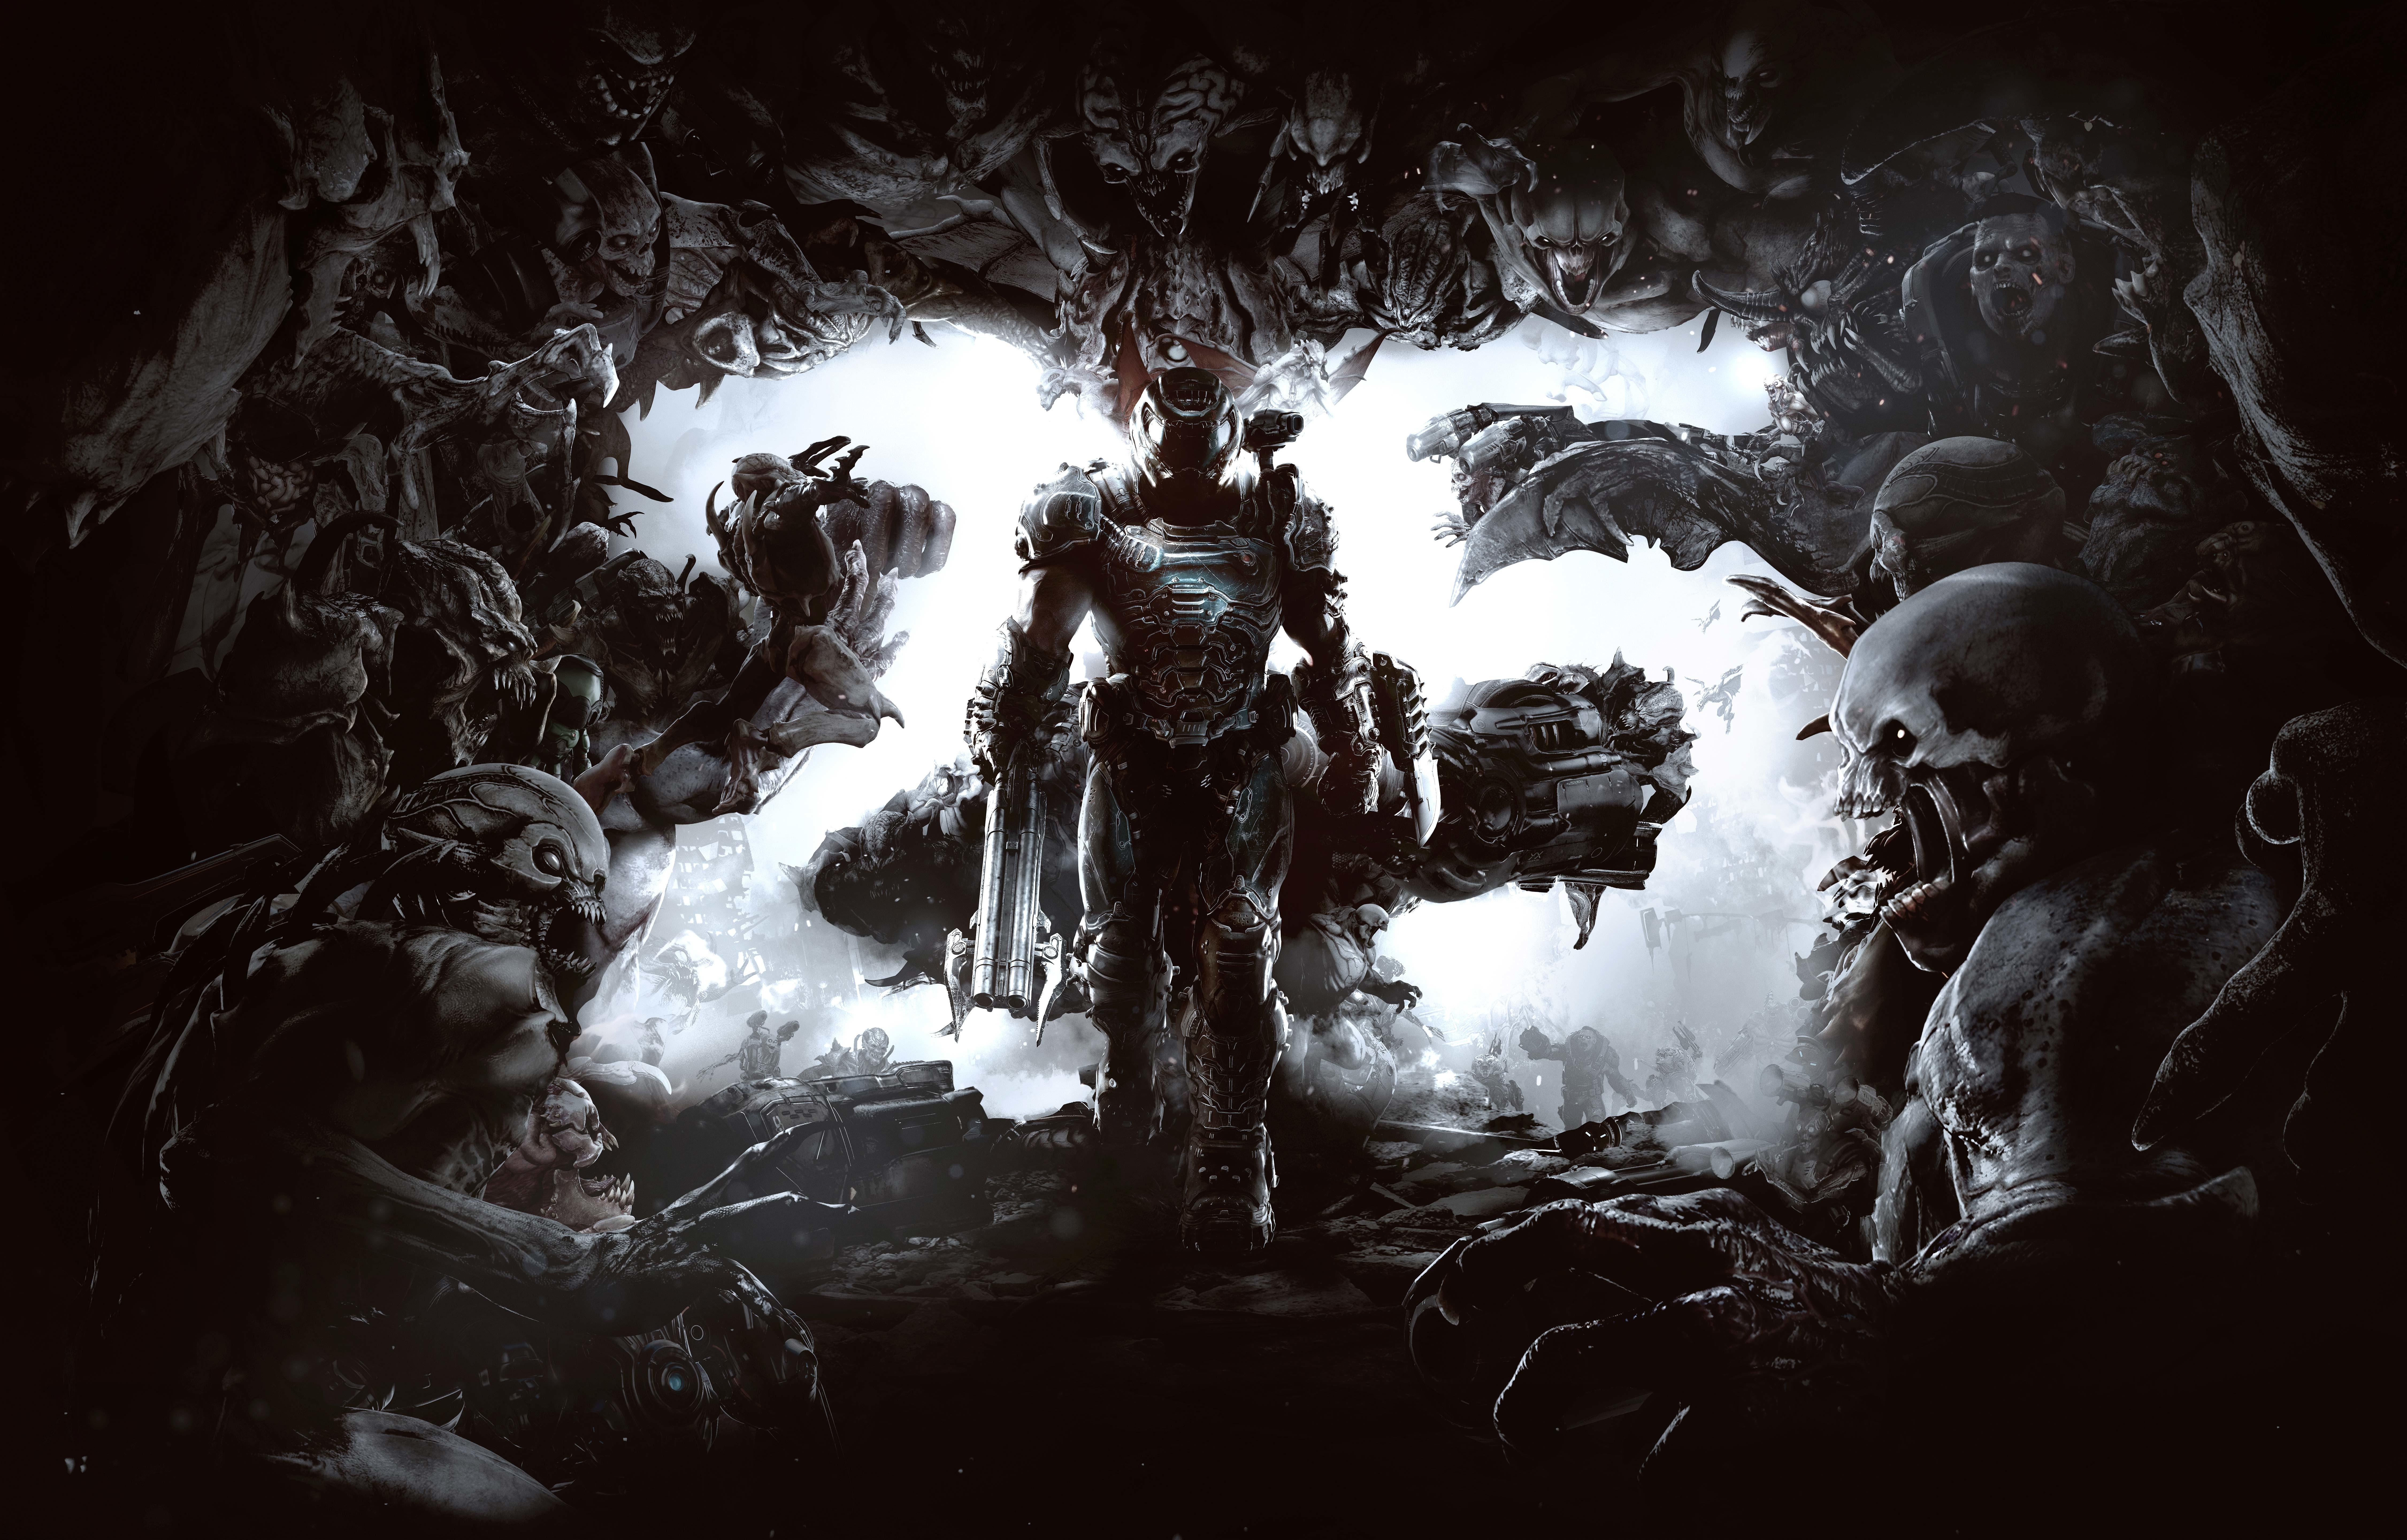 Doom Eternal Wallpaper, HD Games 4K Wallpapers, Images ...